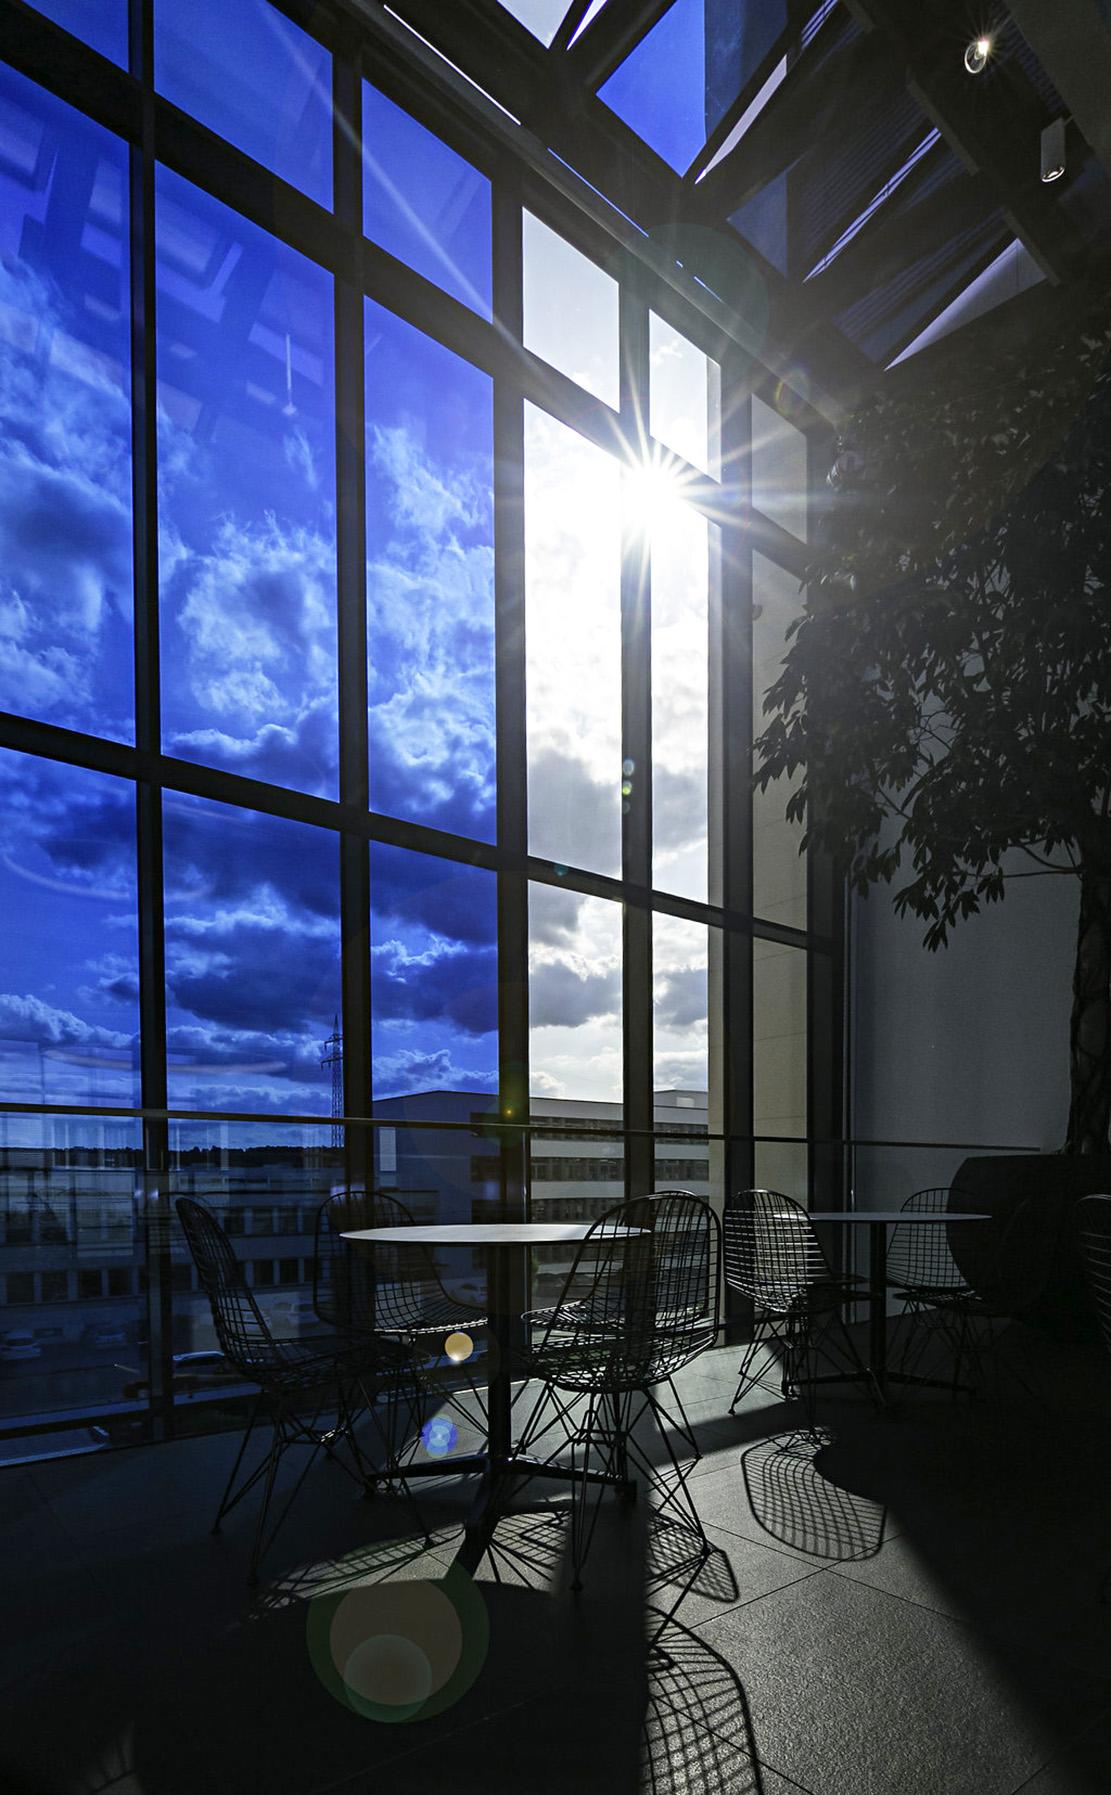 schakelbaar glas 16 meter hoog atrium e control glas in beeld. Black Bedroom Furniture Sets. Home Design Ideas